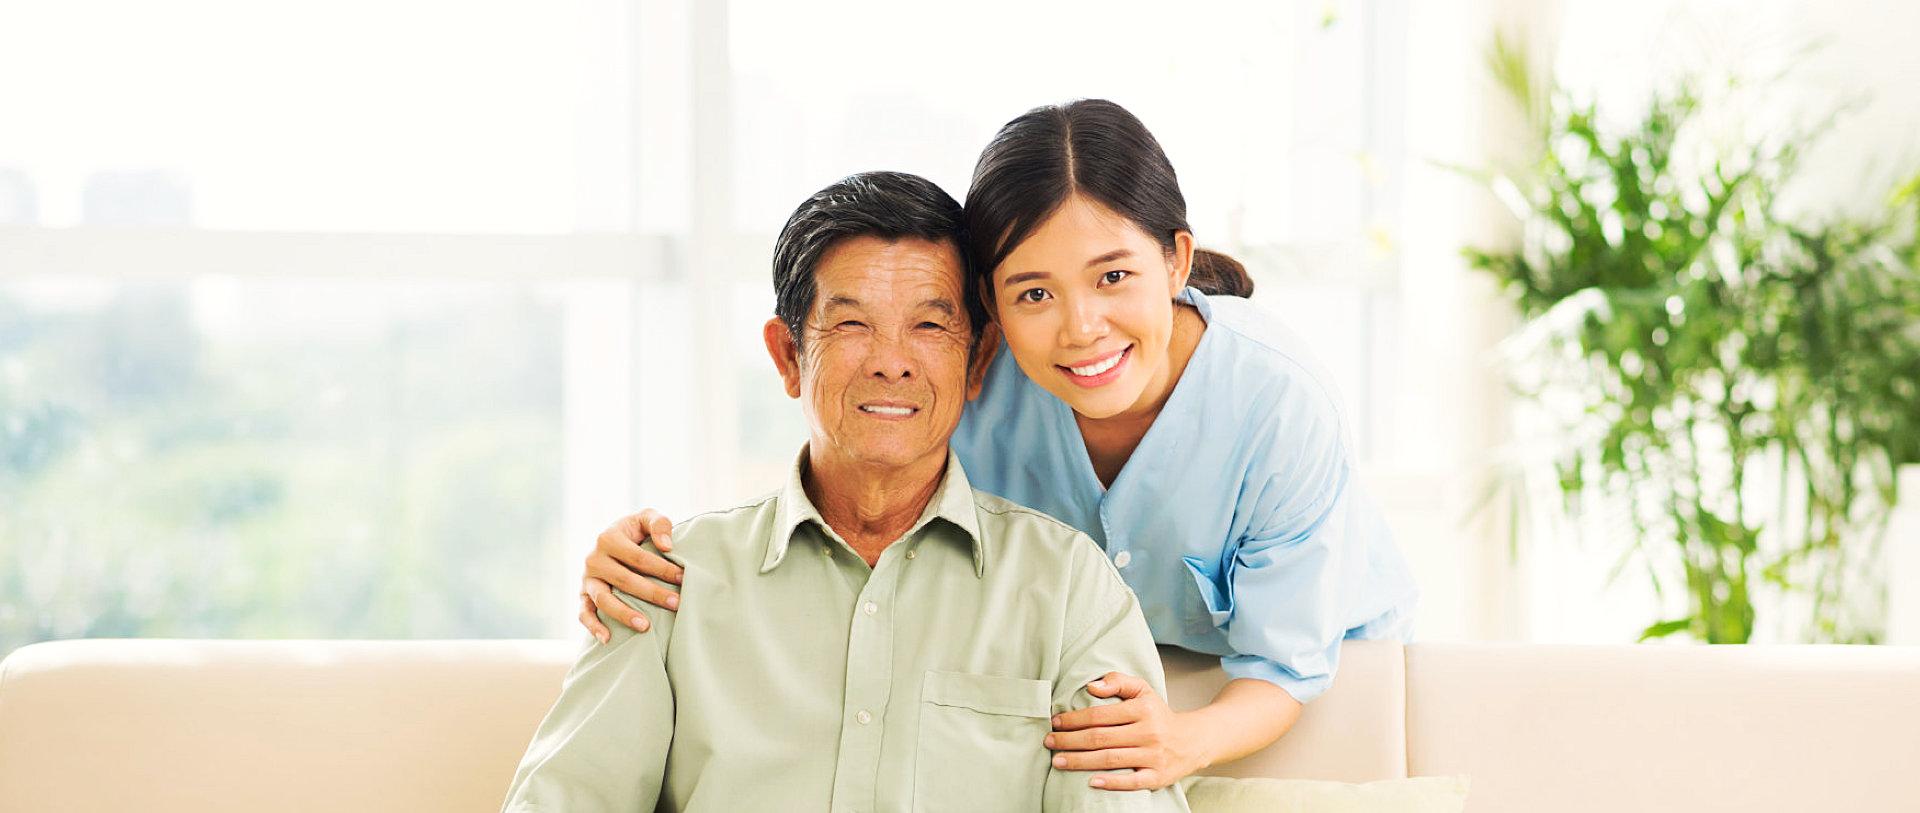 female nurse and senior man smiling